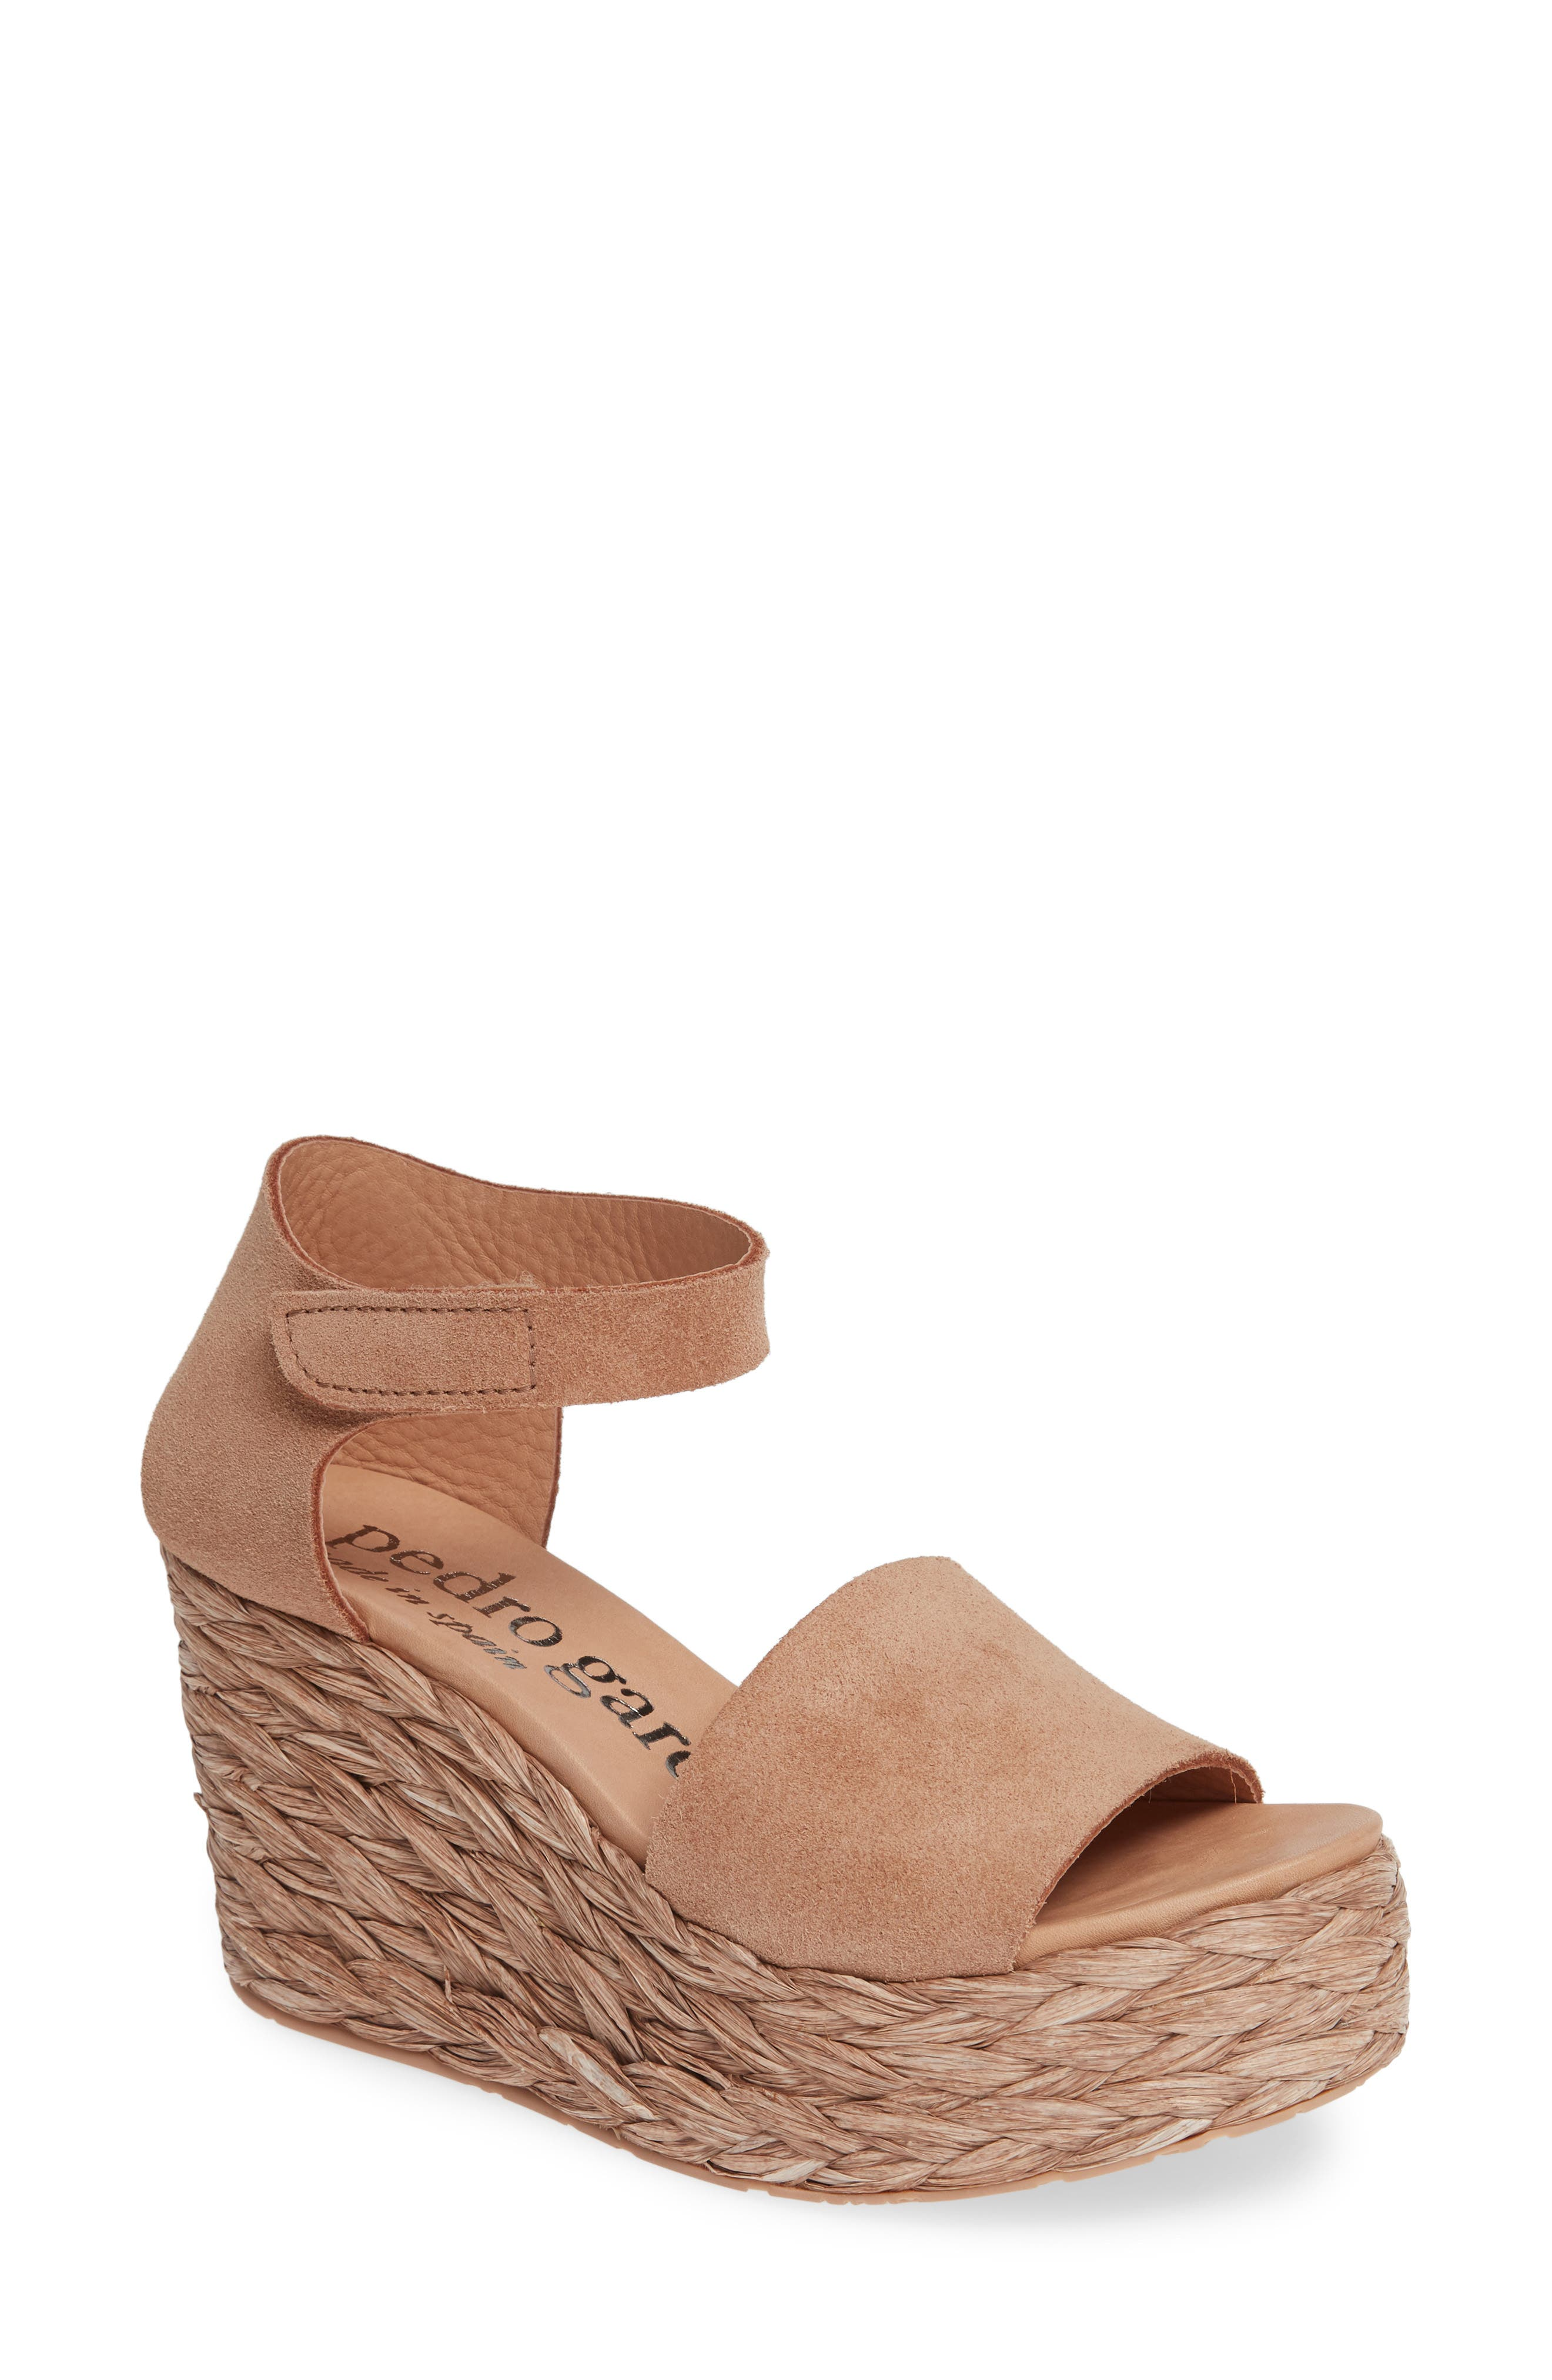 Dory Suede Low-Wedge Espadrille Sandals in Rose Castoro